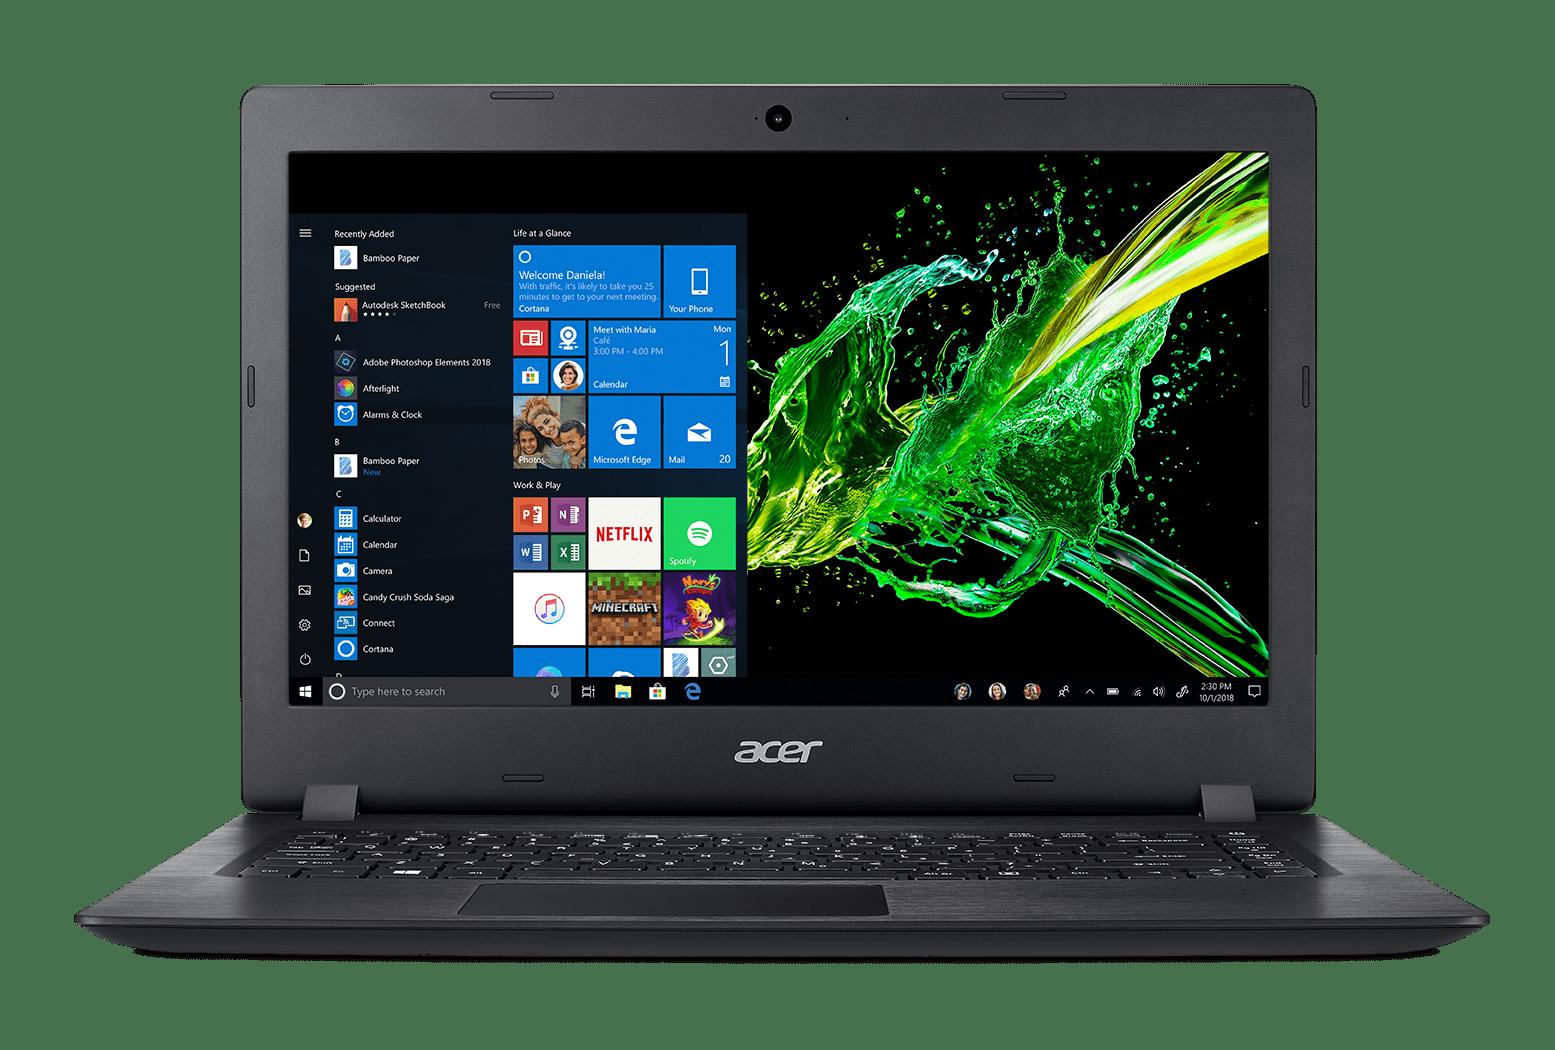 Acer Aspire 3 14 Hd Amd A9 9420e 4gb Ddr4 128gb Ssd Windows 10 In S Mode A314 21 91v1 Walmart Com Walmart Com